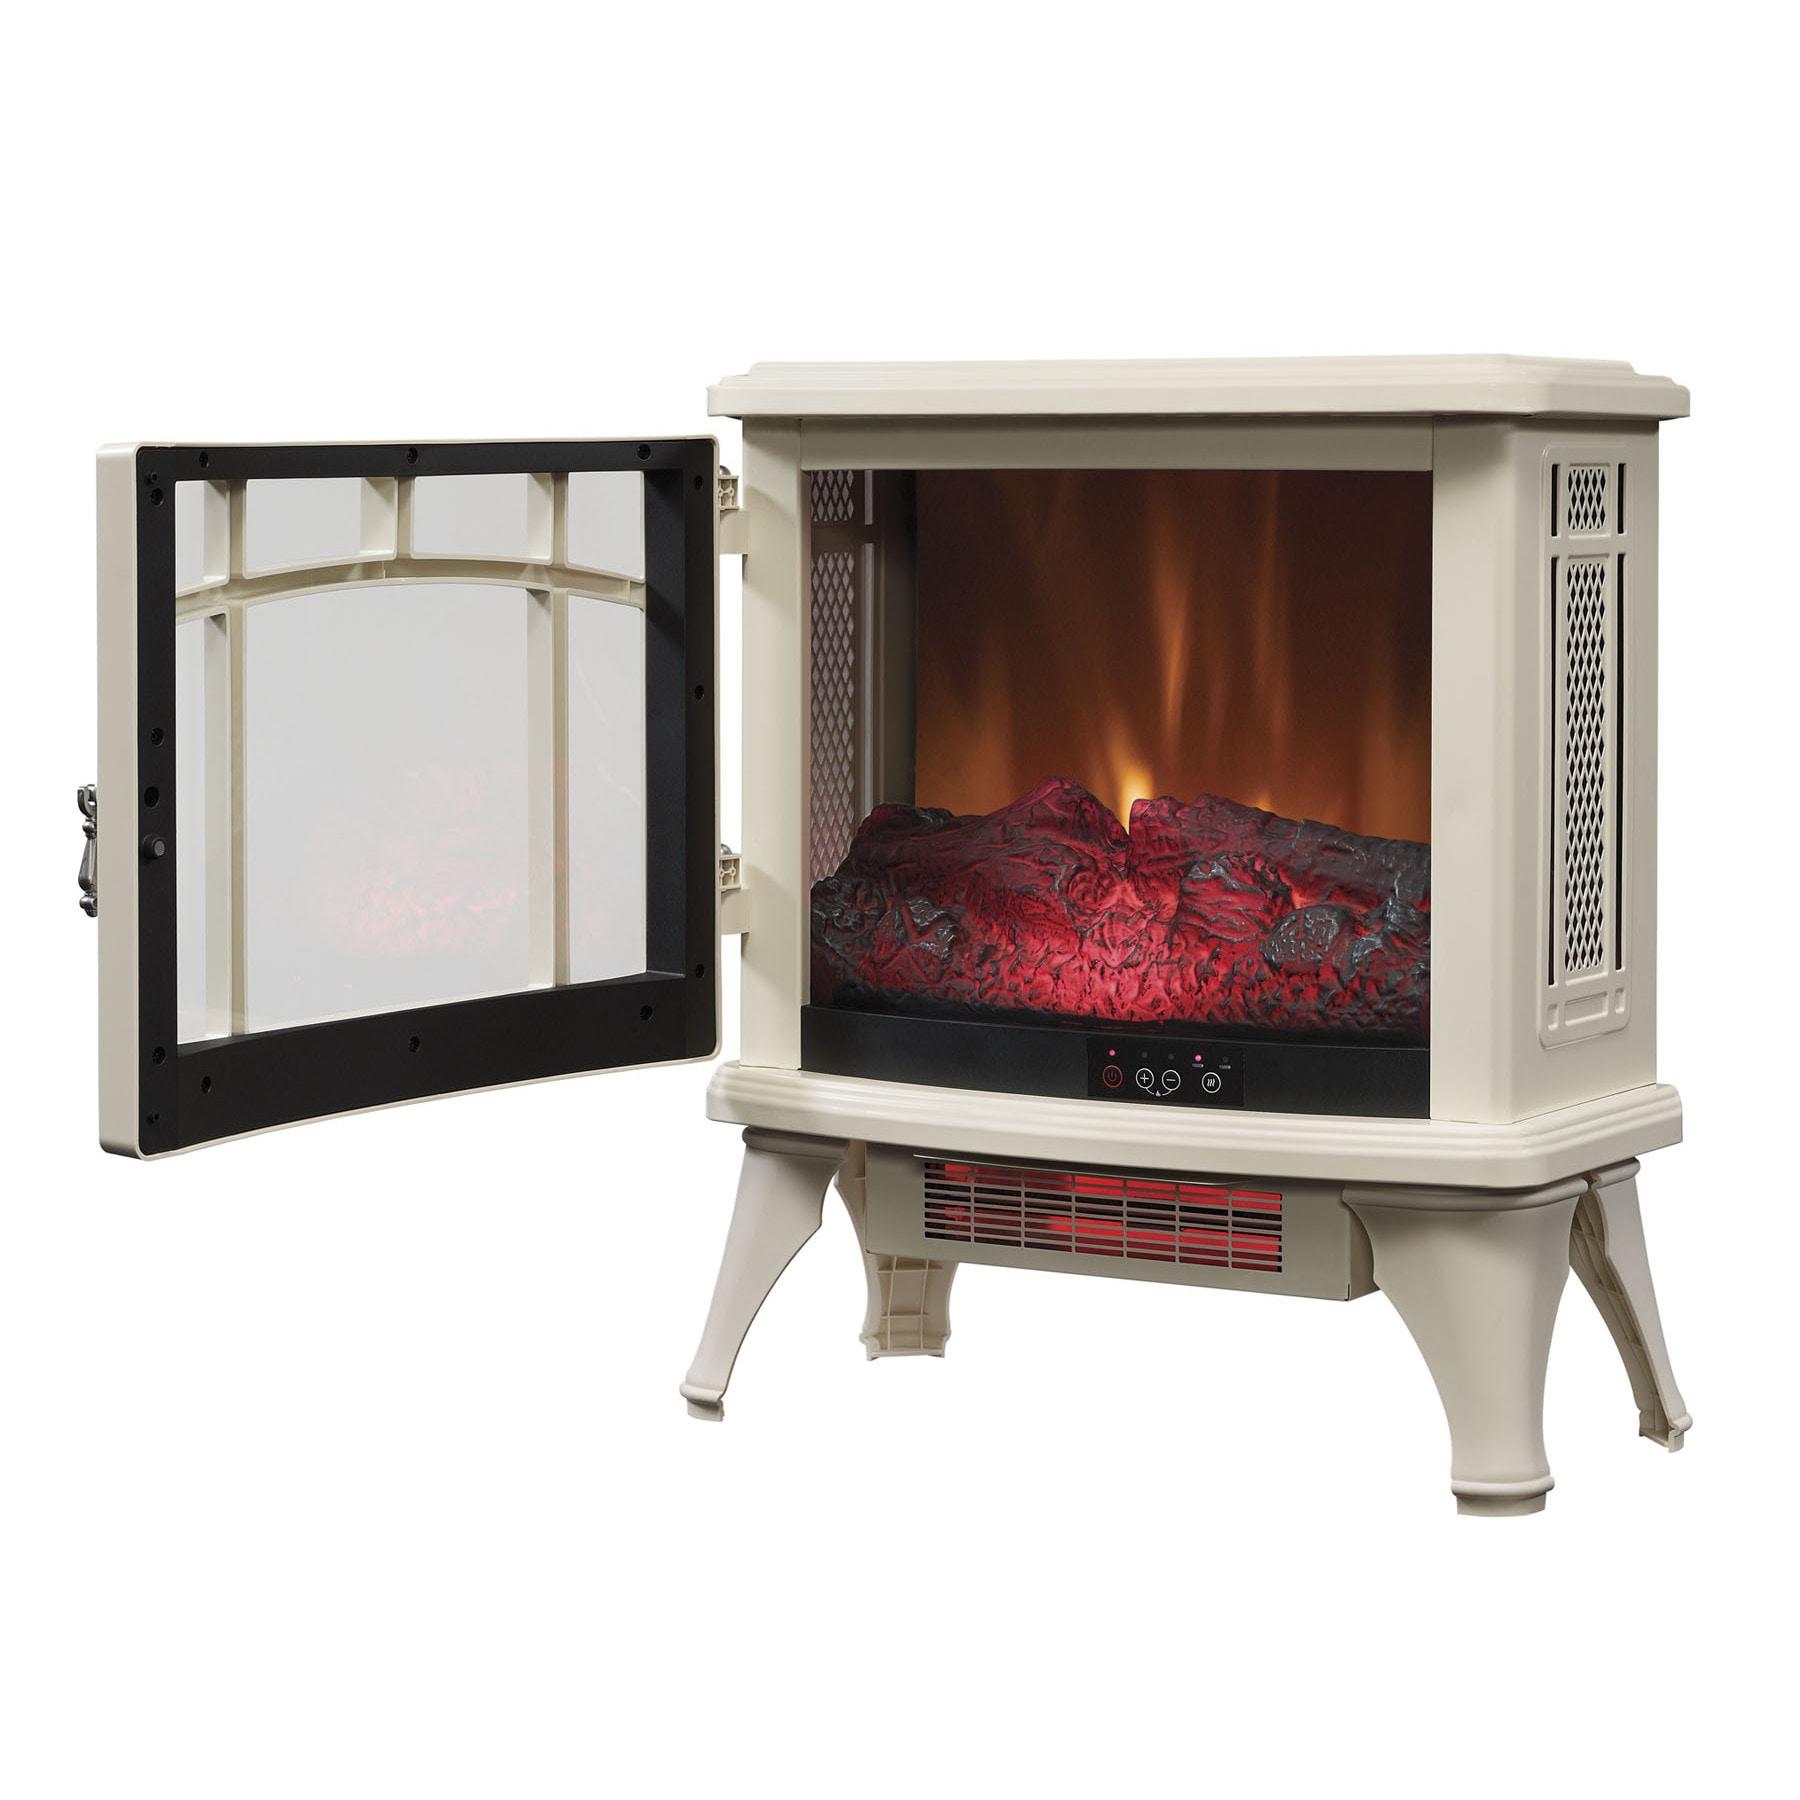 Brilliant Duraflame Dfi501001 Infrared Quartz Electric Fireplace Stove Interior Design Ideas Gentotryabchikinfo